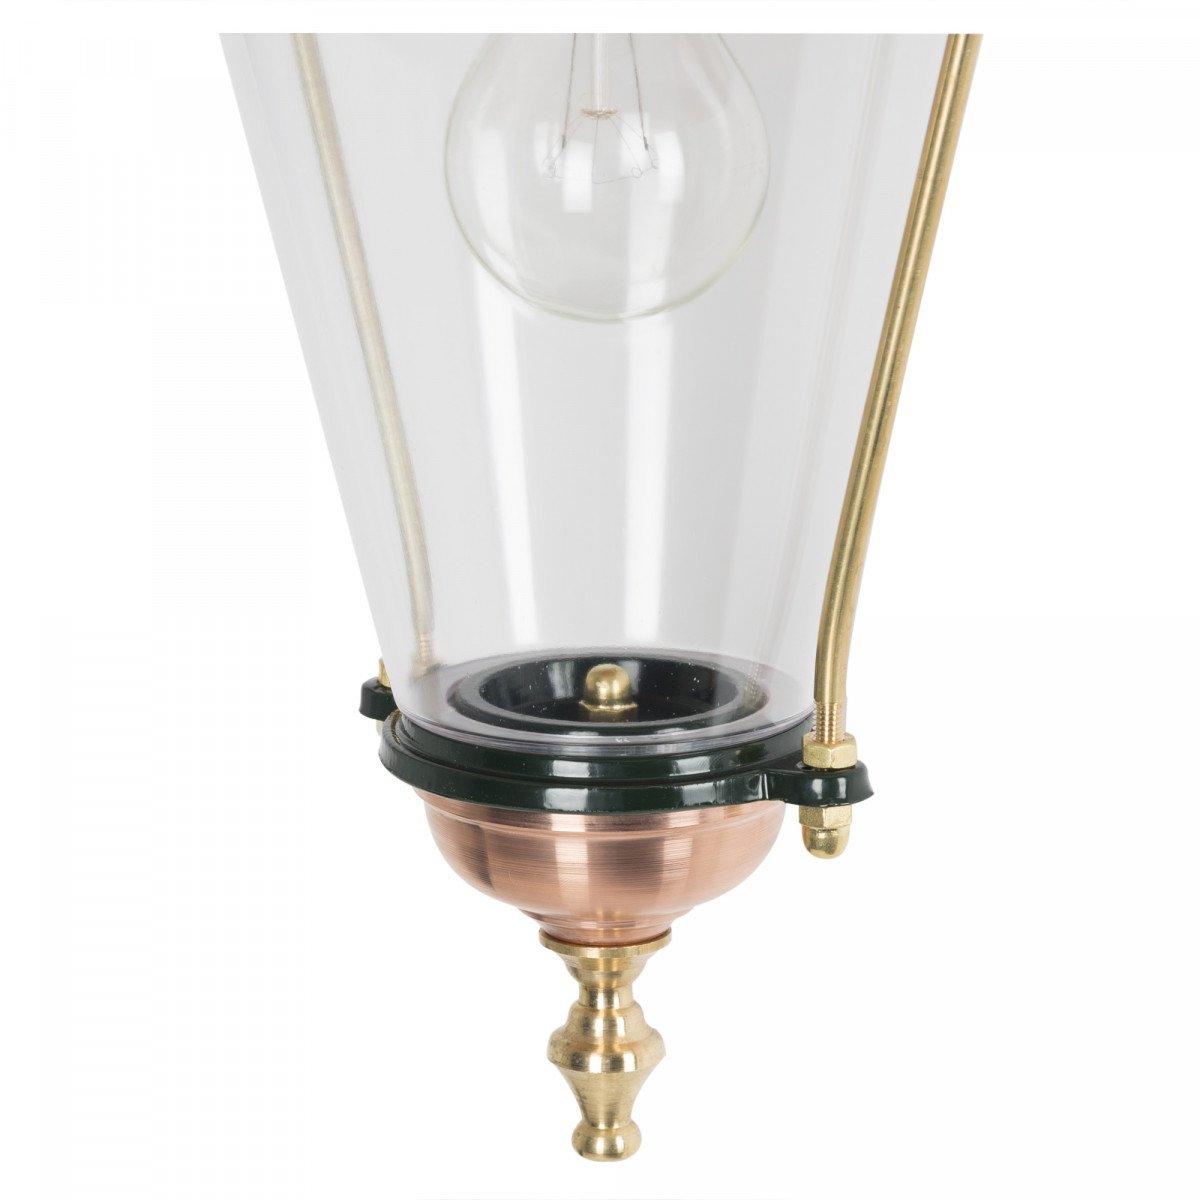 Buitenlamp Hoorn hang Dag Nacht sensor LED Schemersensor